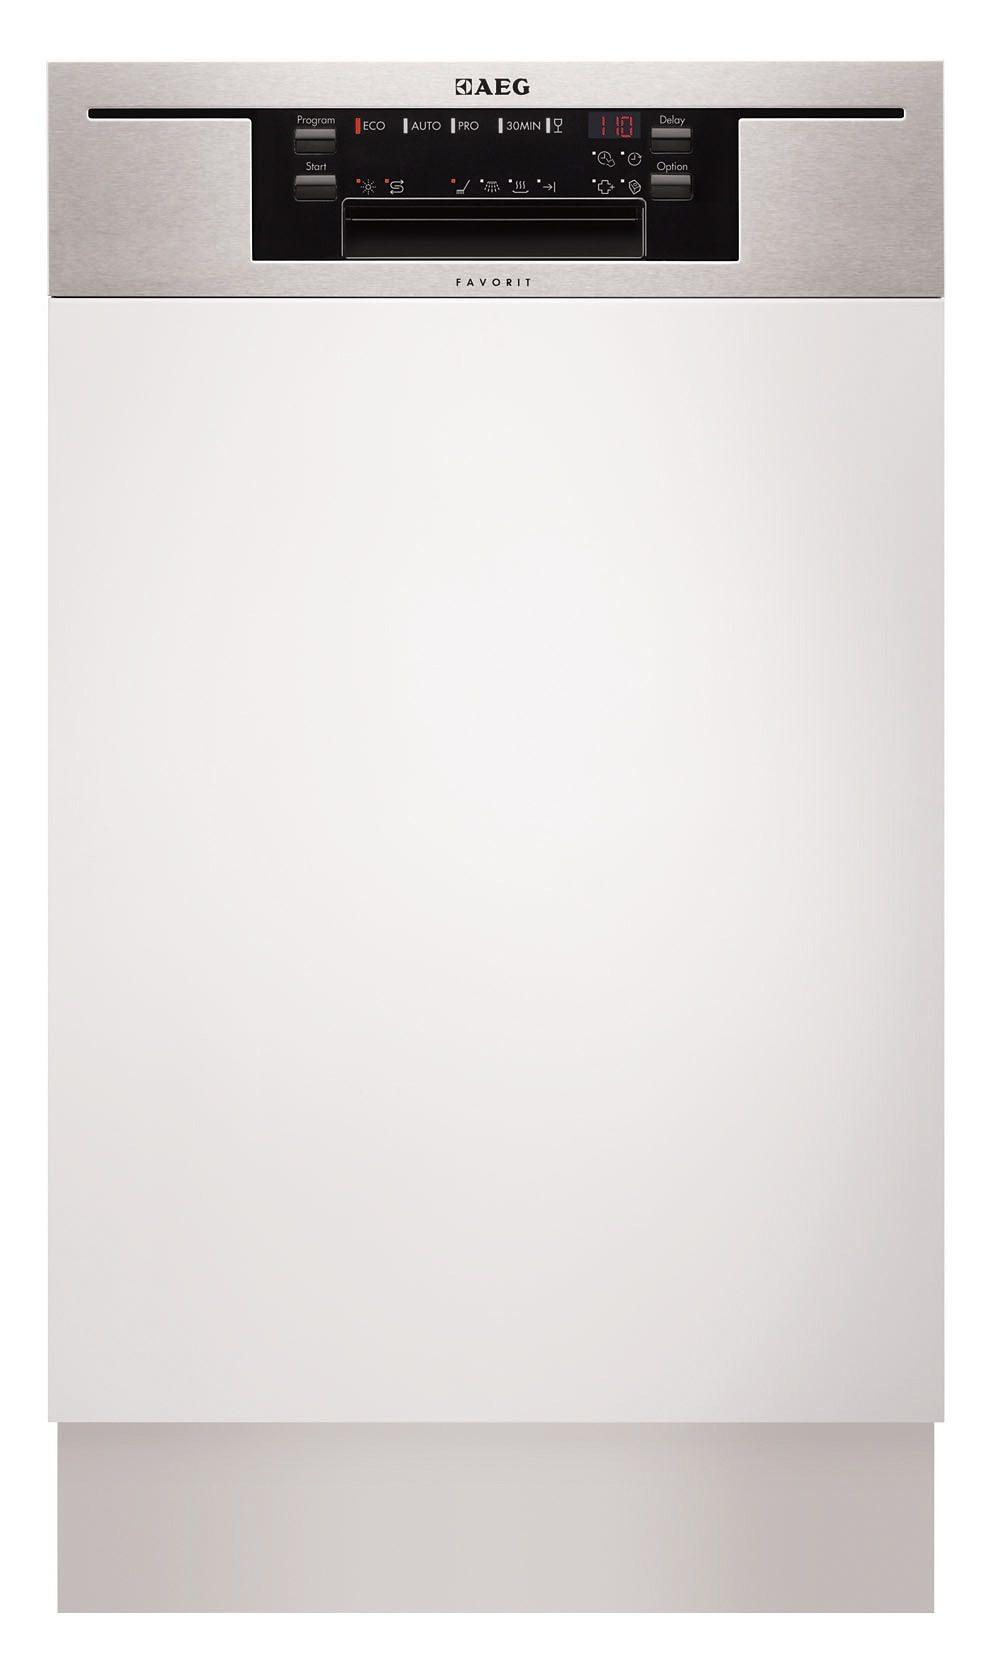 AEG integrierbarer Einbau-Geschirrspüler FAVORIT / F65412IMOP, A++, 9,9 Liter, 9 Maßgedecke